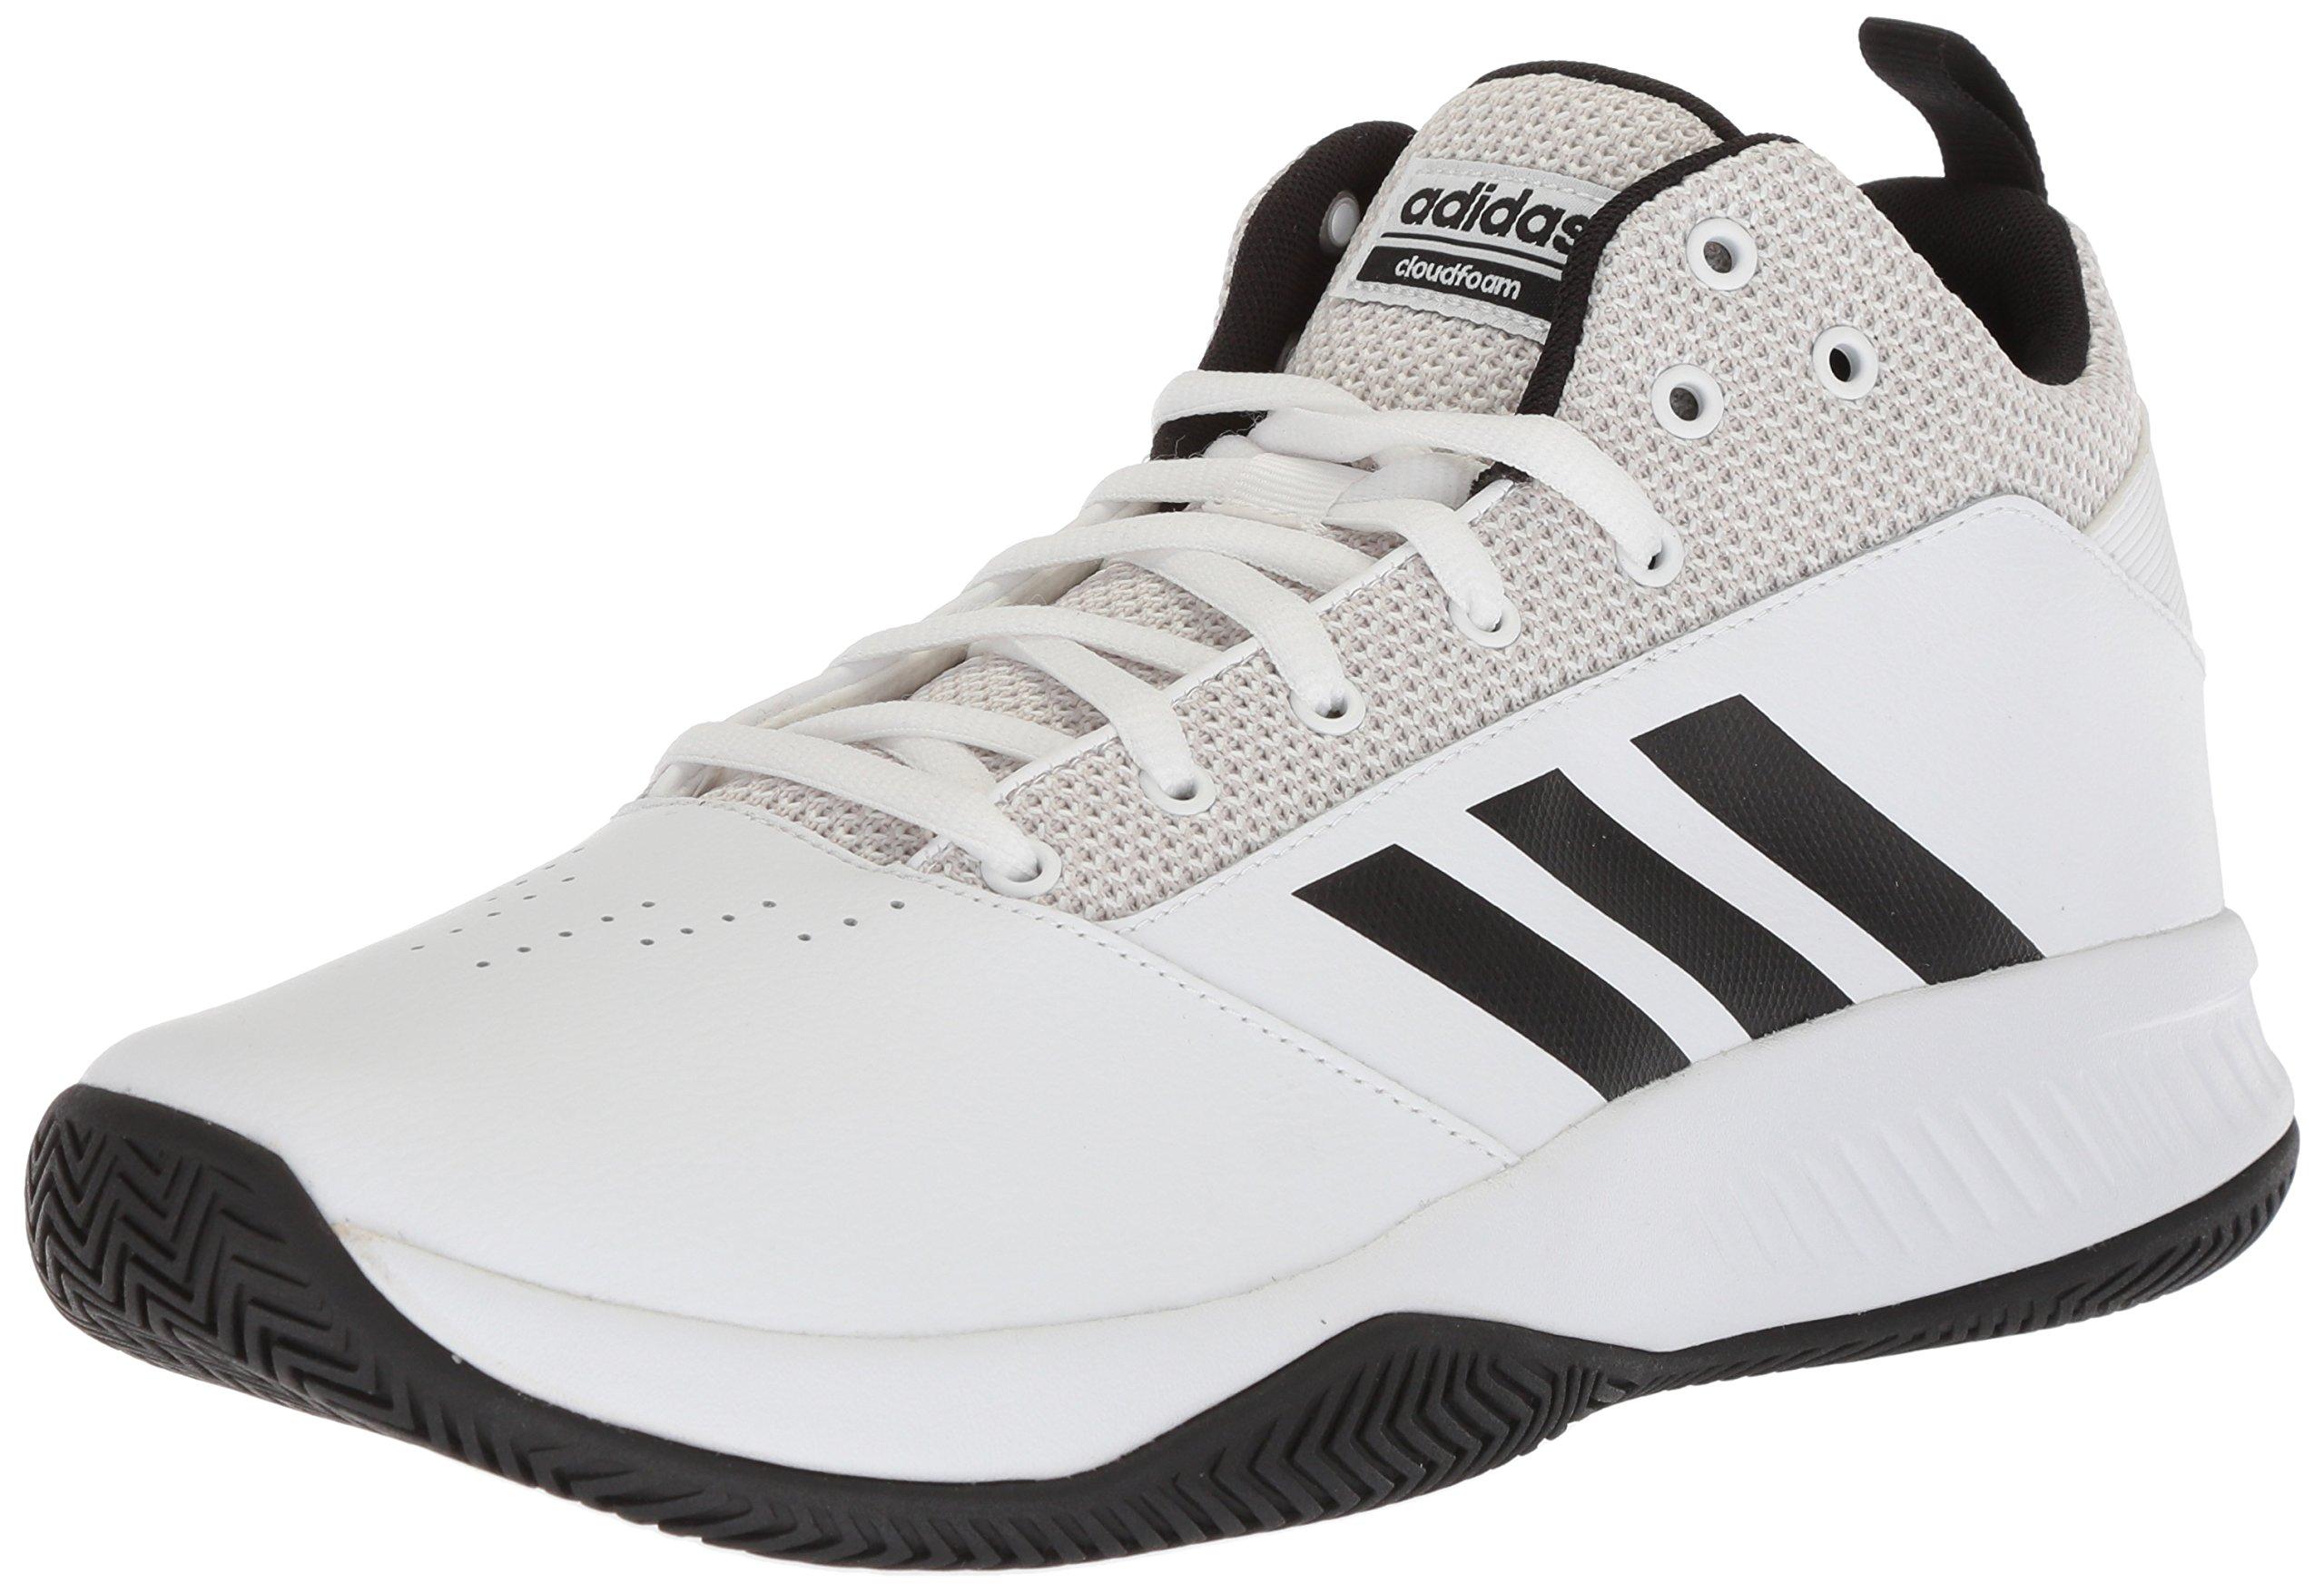 fb05537f7029 Galleon - Adidas Men s CF Ilation 2.0 Basketball Shoe